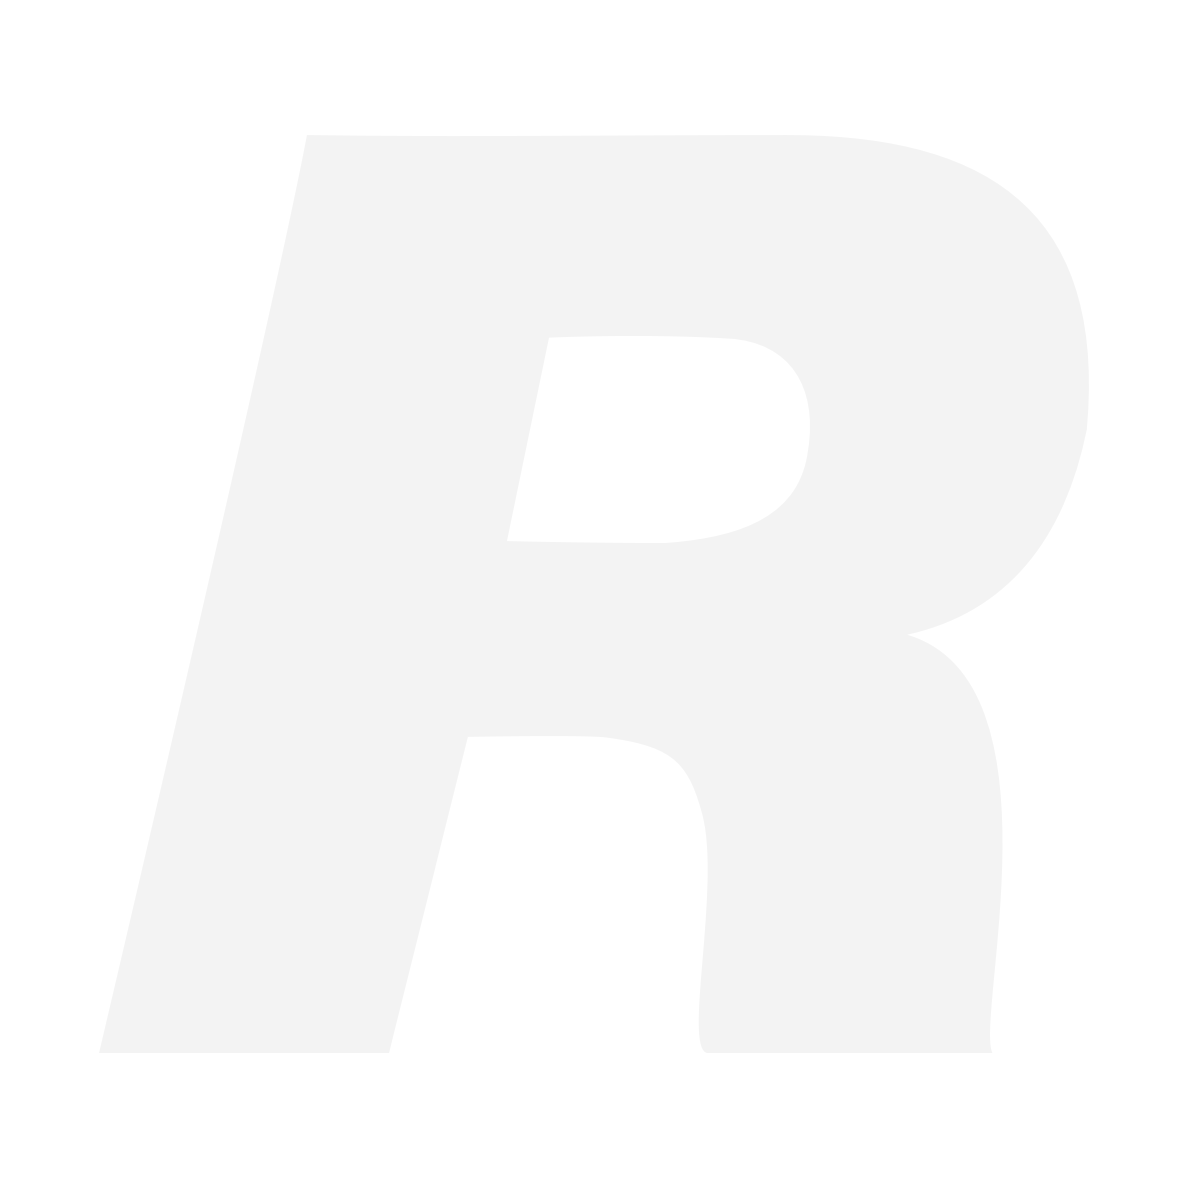 RICOH A12 50mm f/2.5 MACRO KÄYTETTY